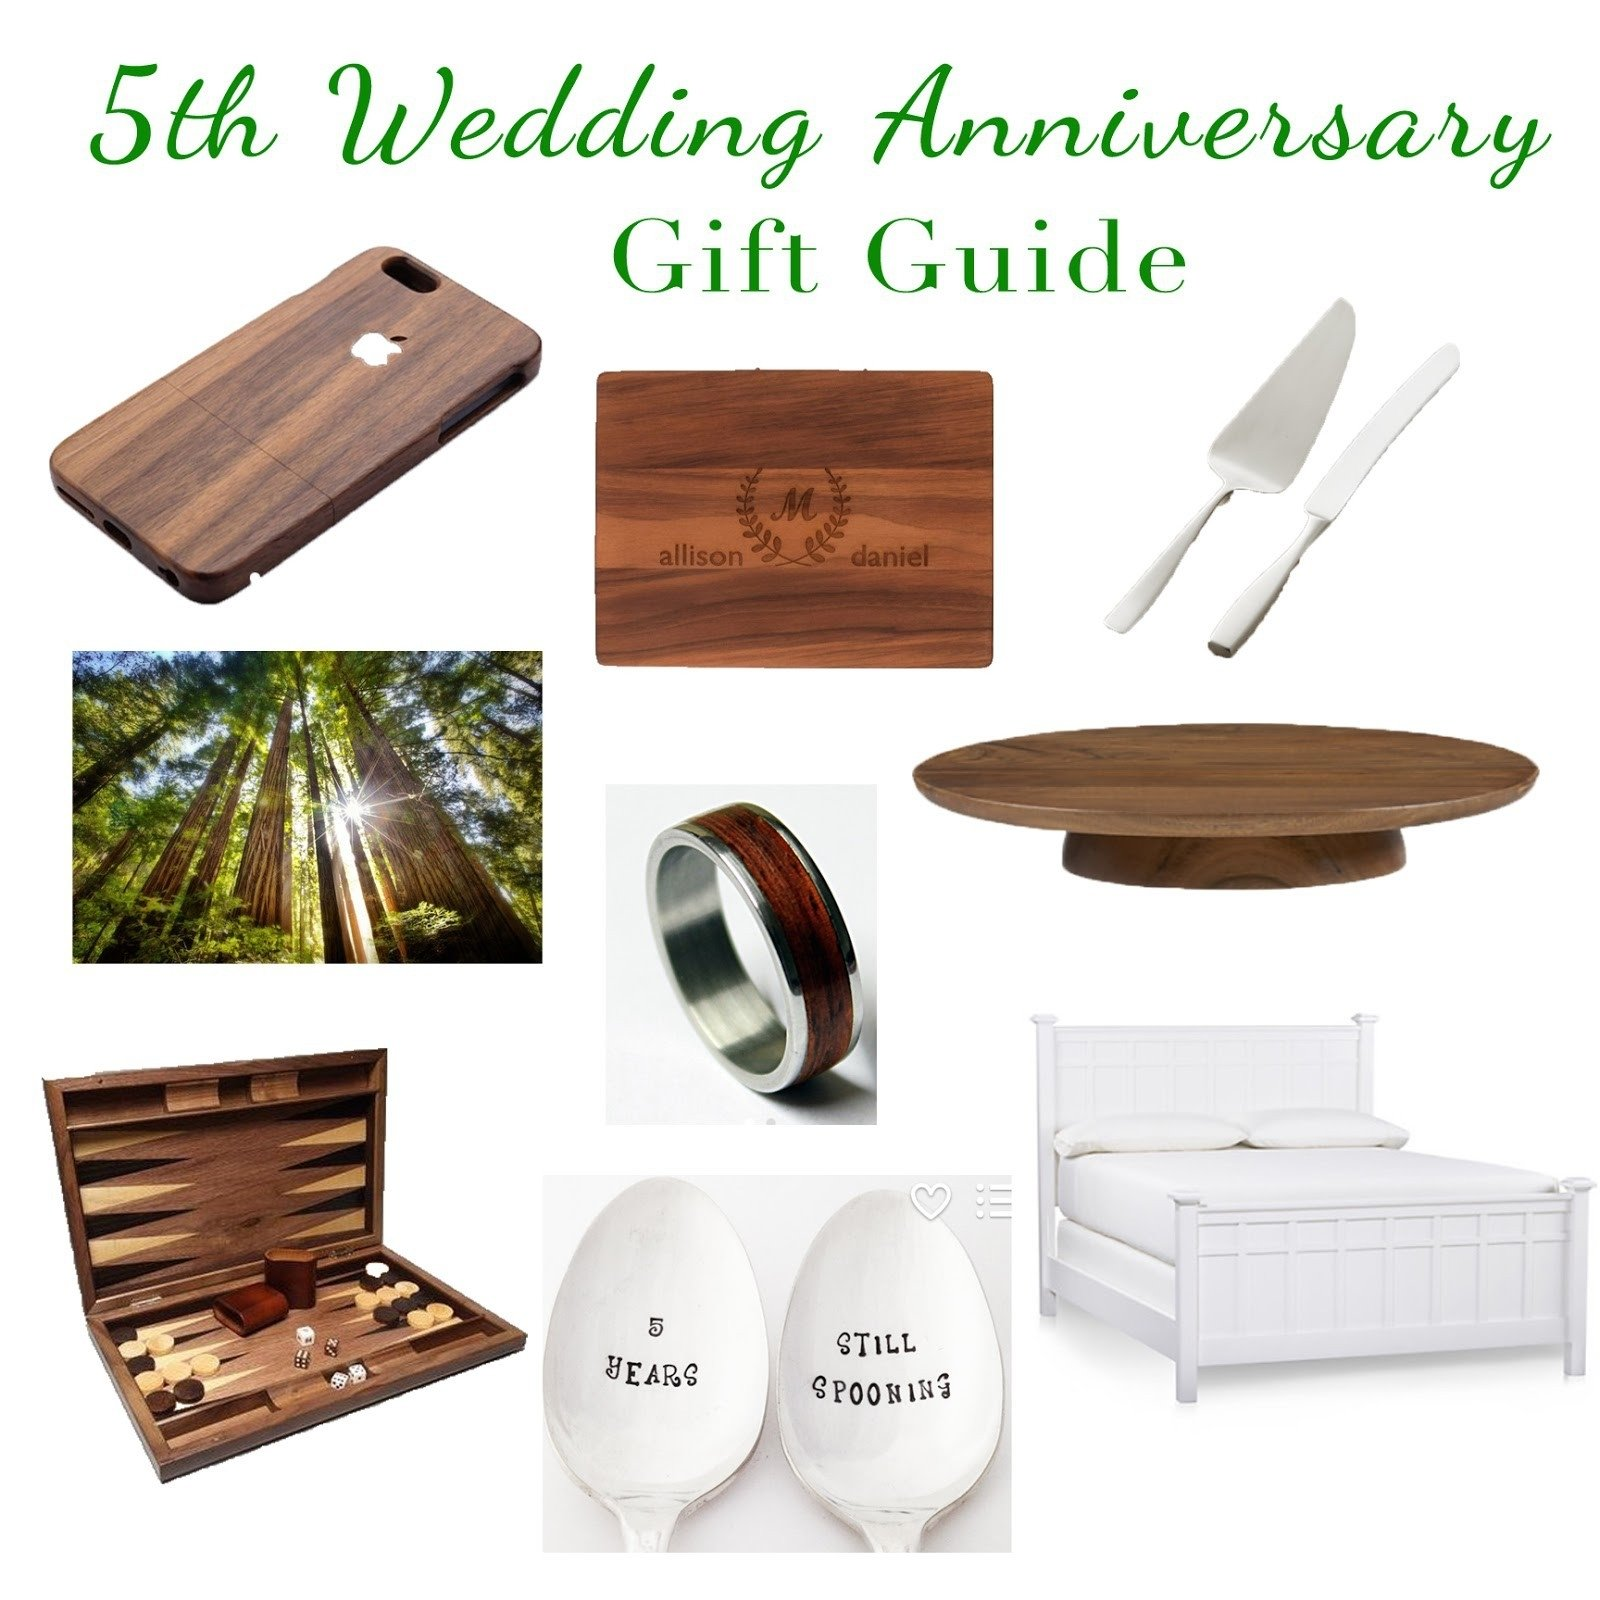 10 Gorgeous Five Year Anniversary Gift Ideas fifth year wedding anniversary gift ideas elegant the adventure 1 2021